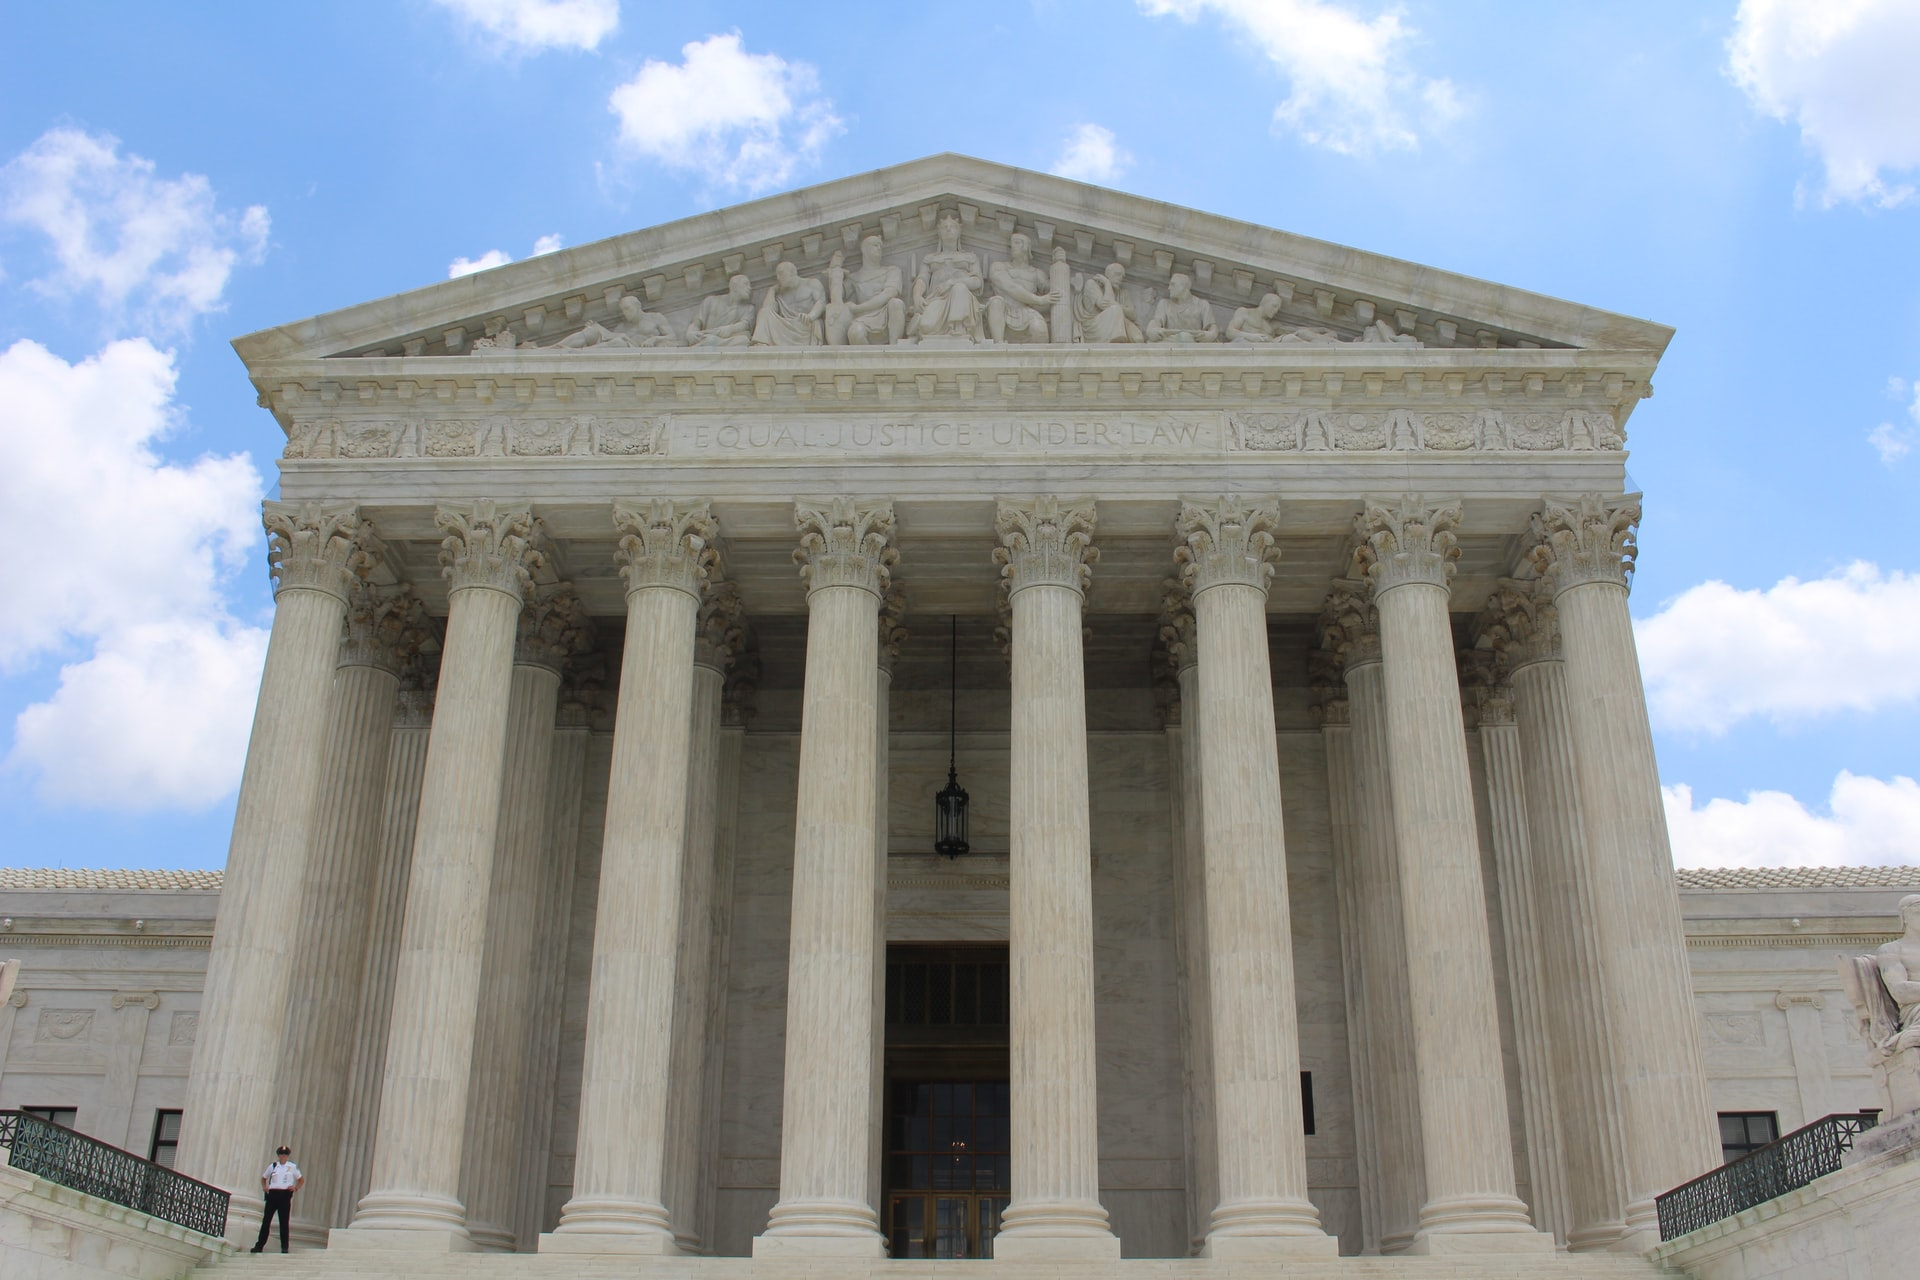 c-Legal-Building-claire-anderson